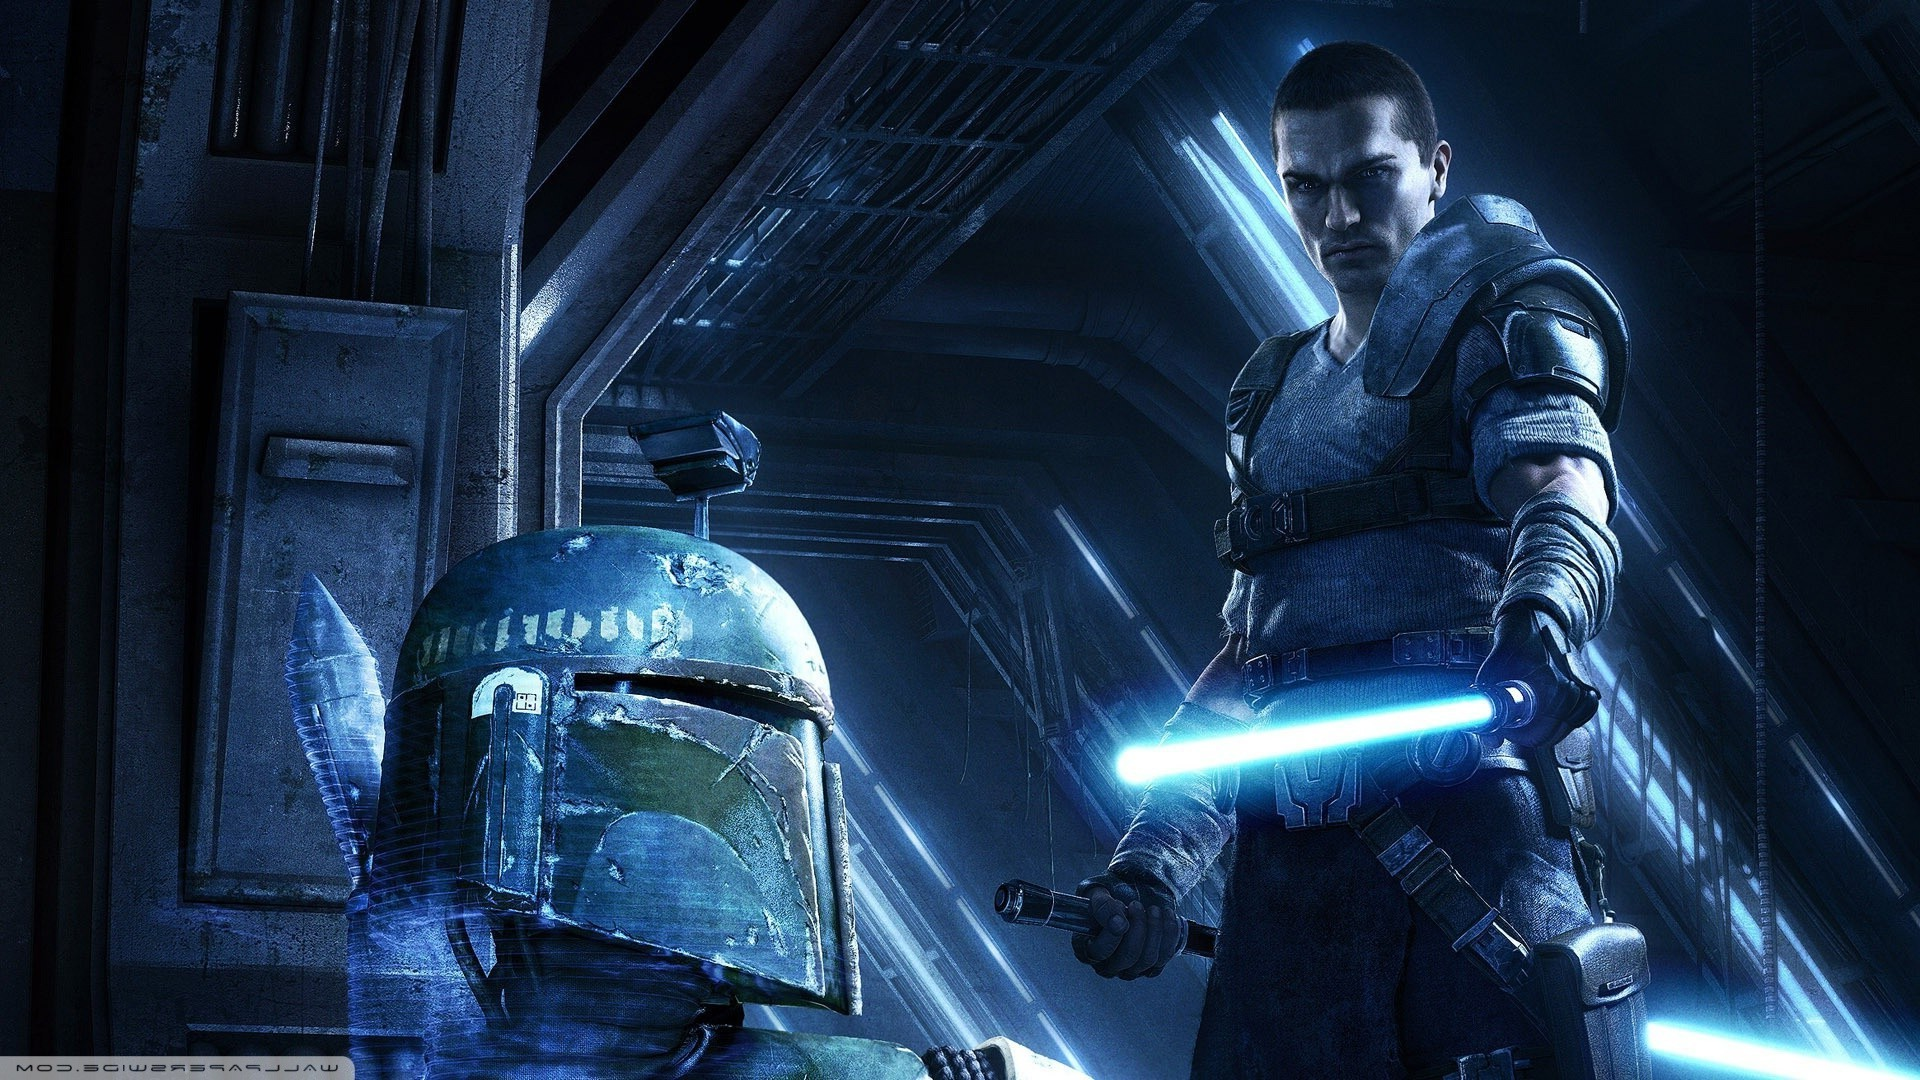 Star Wars, Star Wars: The Force Unleashed, Starkiller Wallpapers HD /  Desktop and Mobile Backgrounds